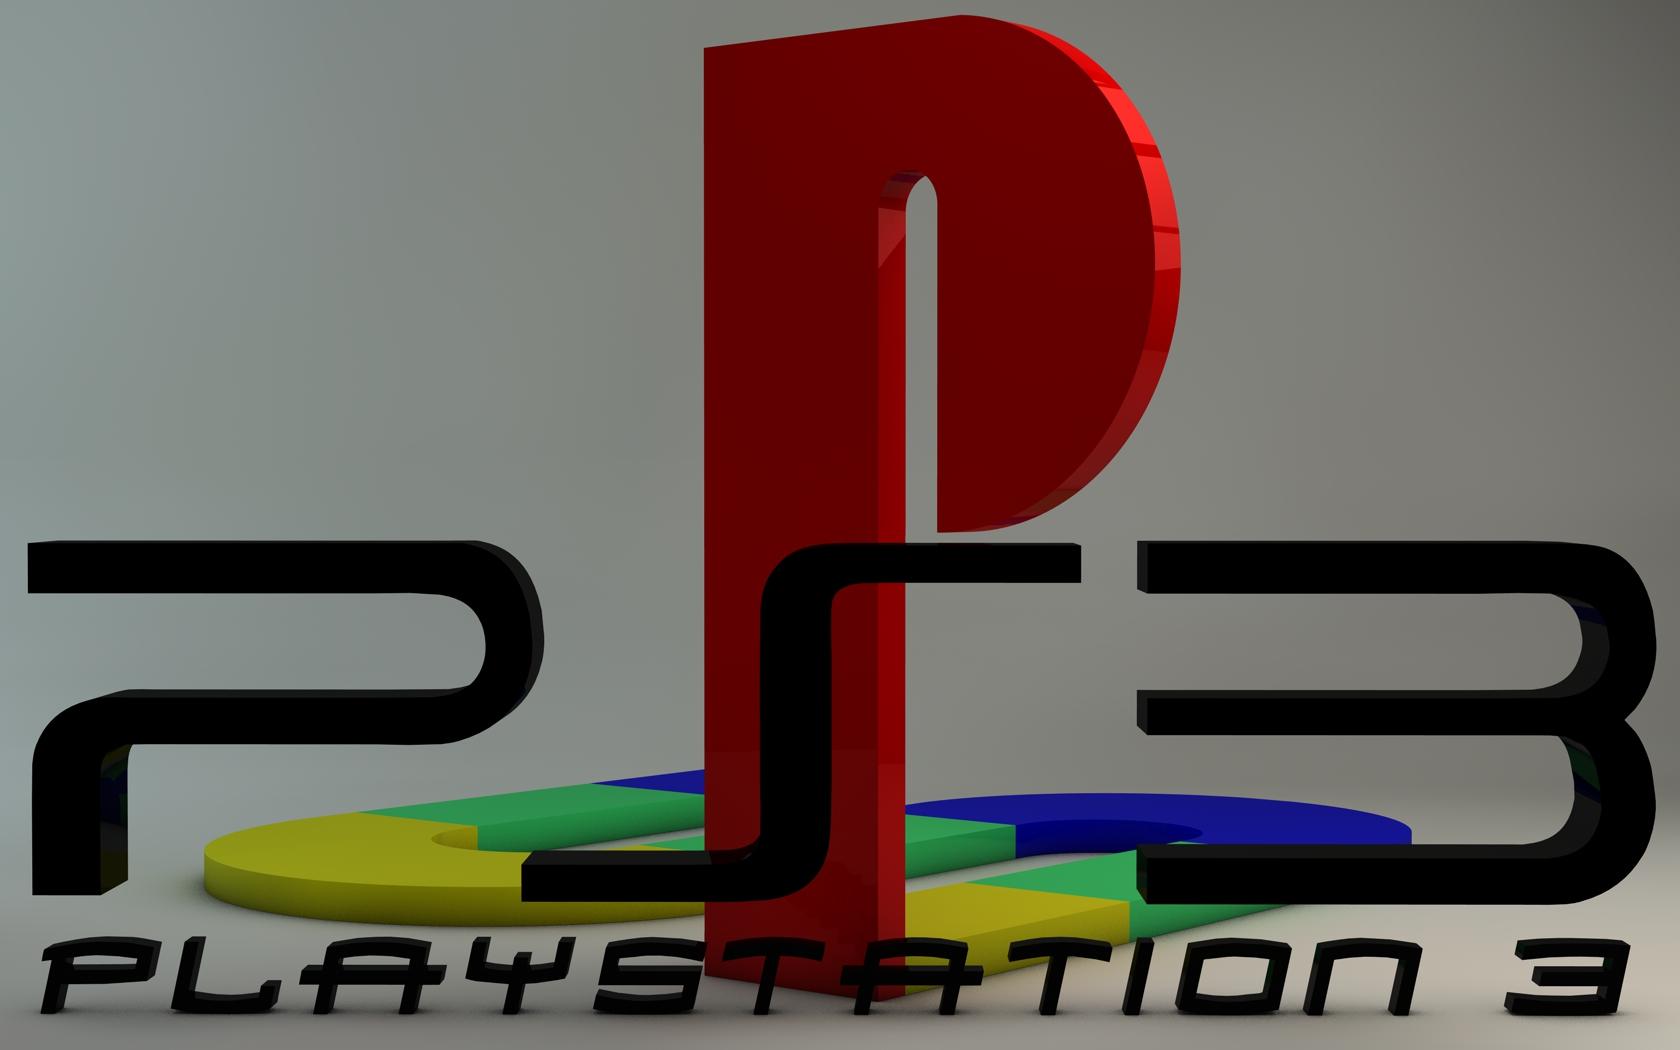 PlayStation 3 Logo by Dracu-Teufel666 on DeviantArt